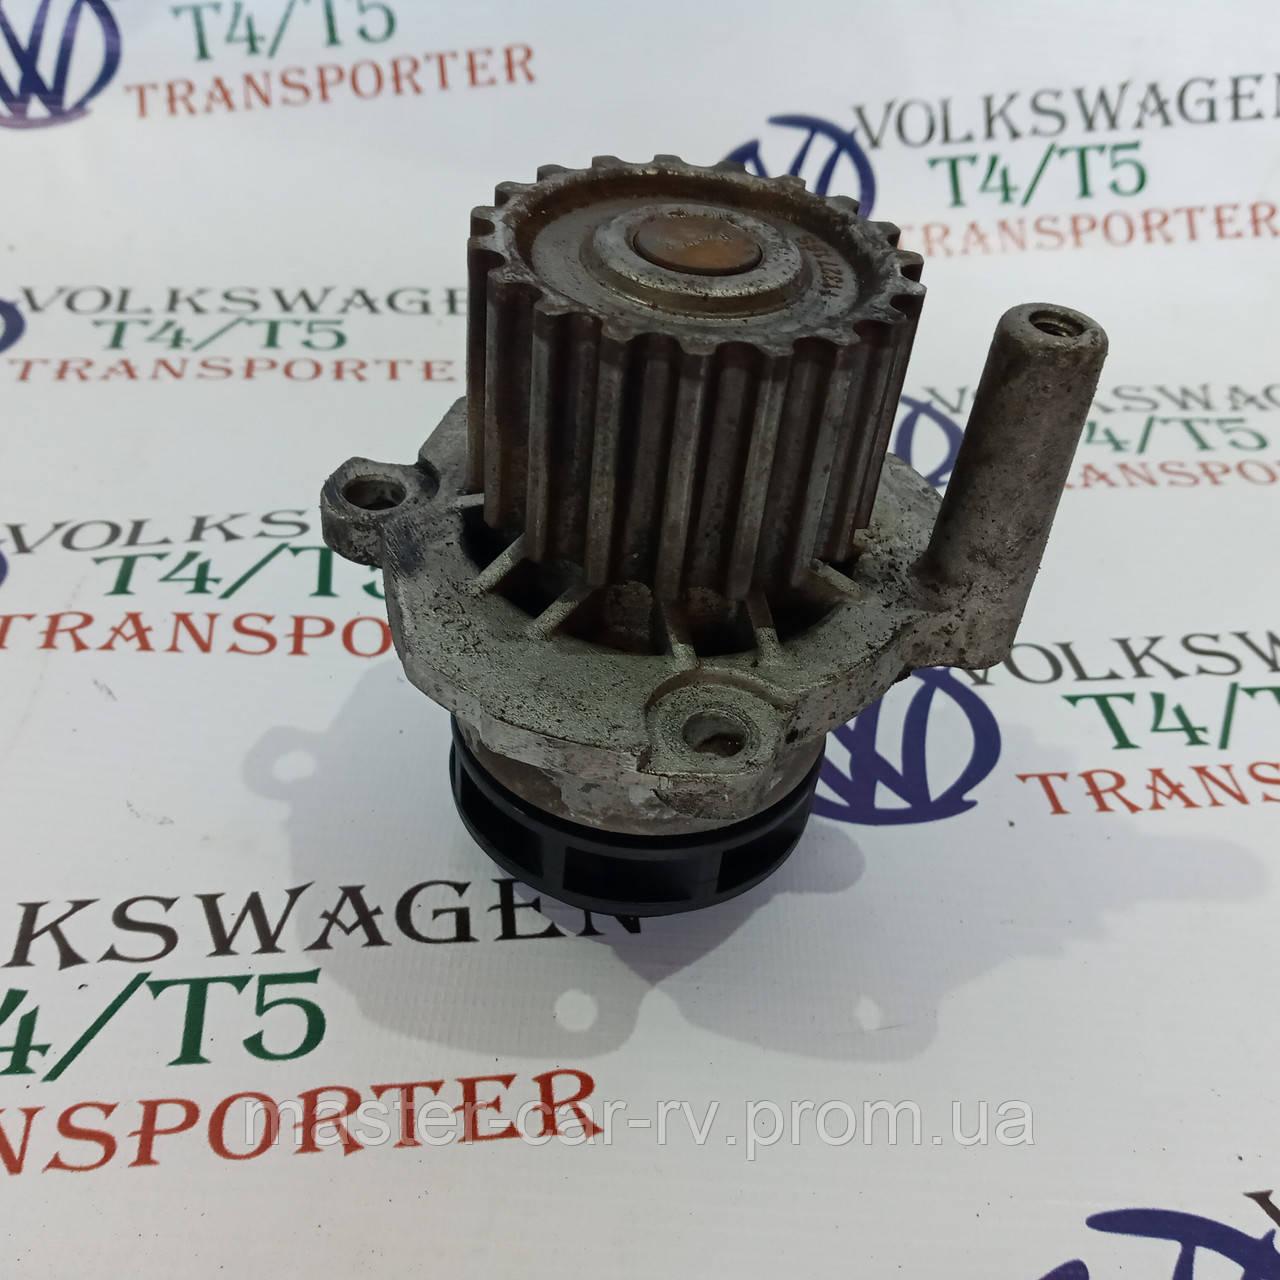 Помпа на транспортер т5 цена фольксваген транспортер авито ульяновск